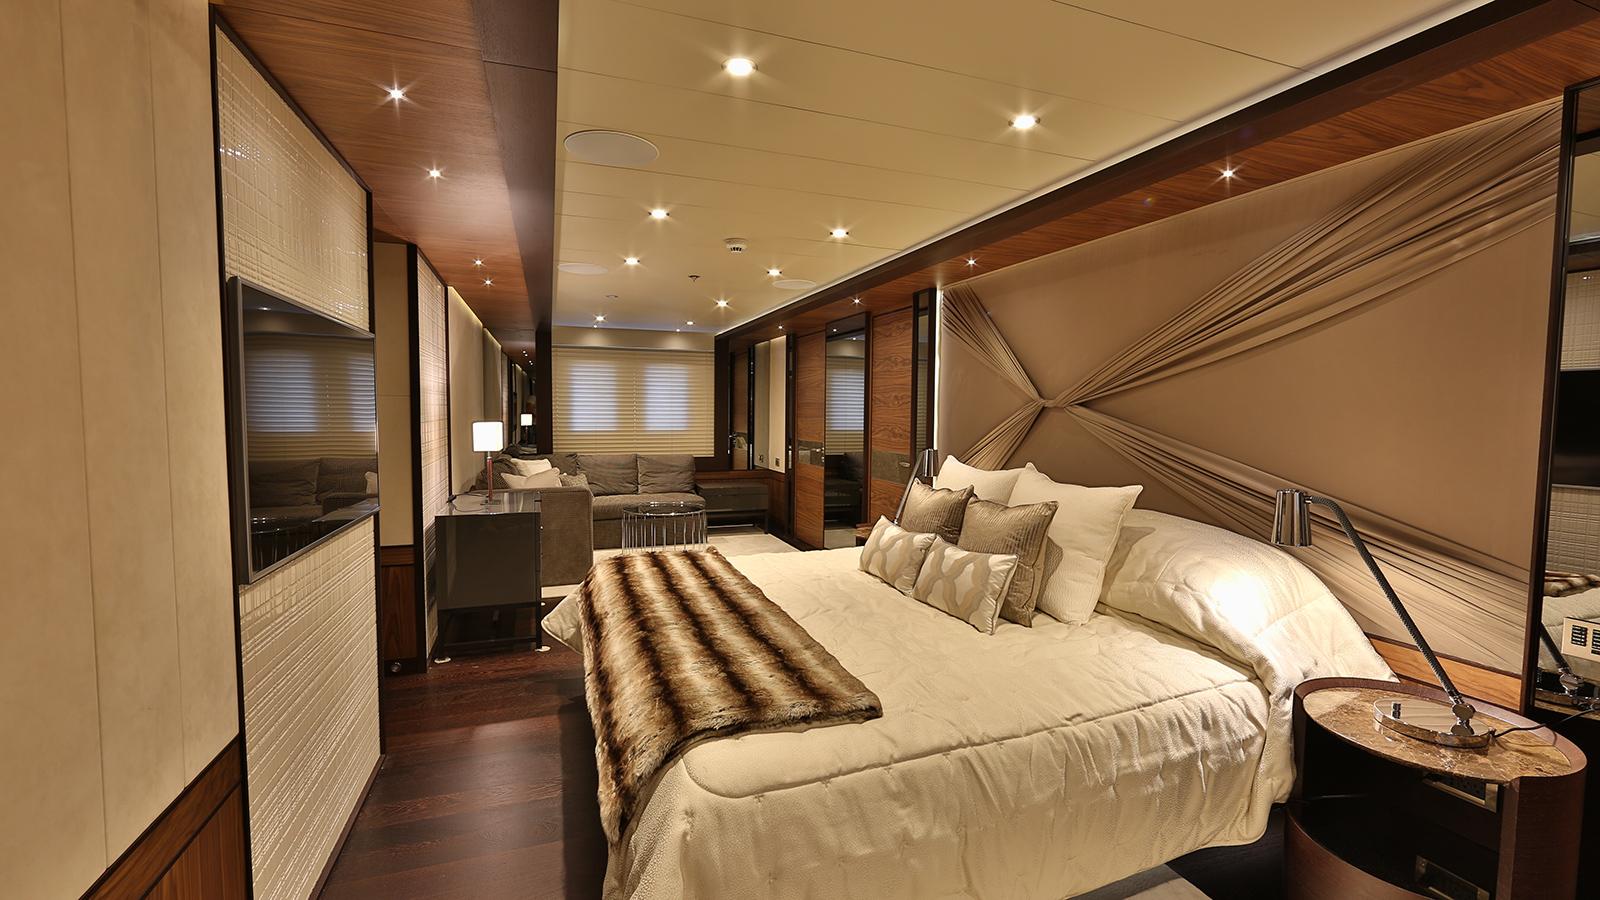 the-lower-deck-master-cabin-on-the-bilgin-superyacht-giaola-lu